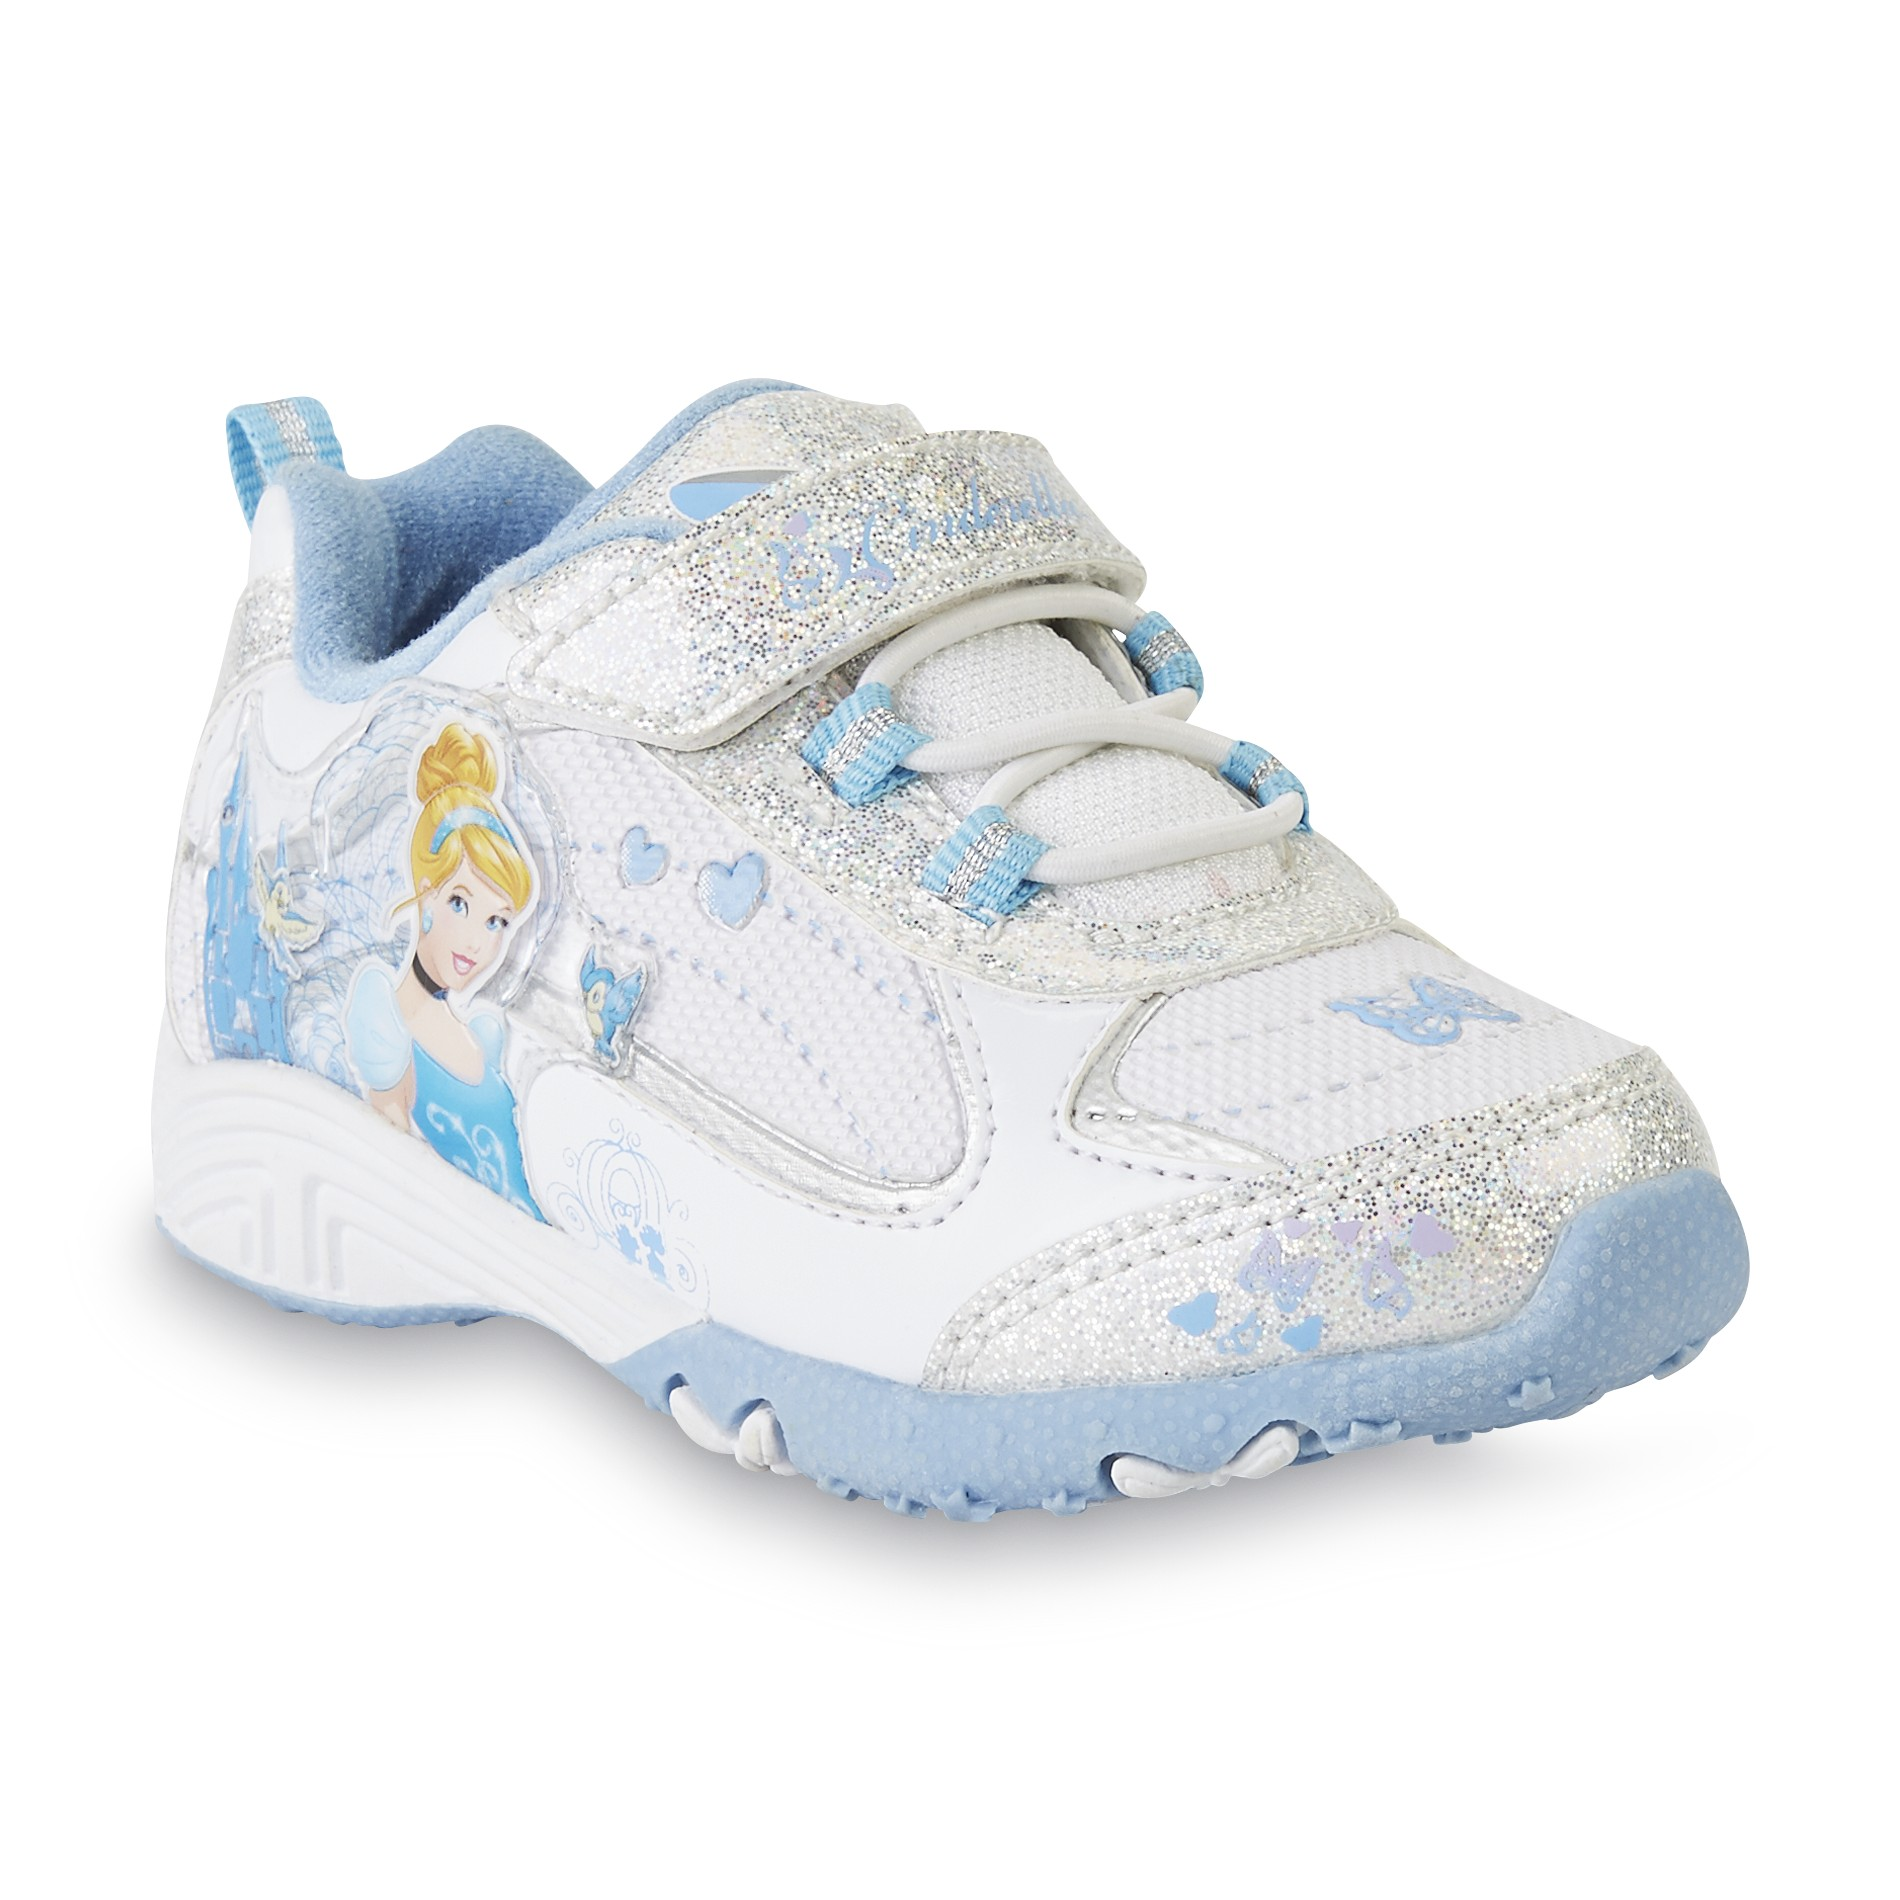 Disney Toddler Girl's Cinderella White/Blue Sneaker